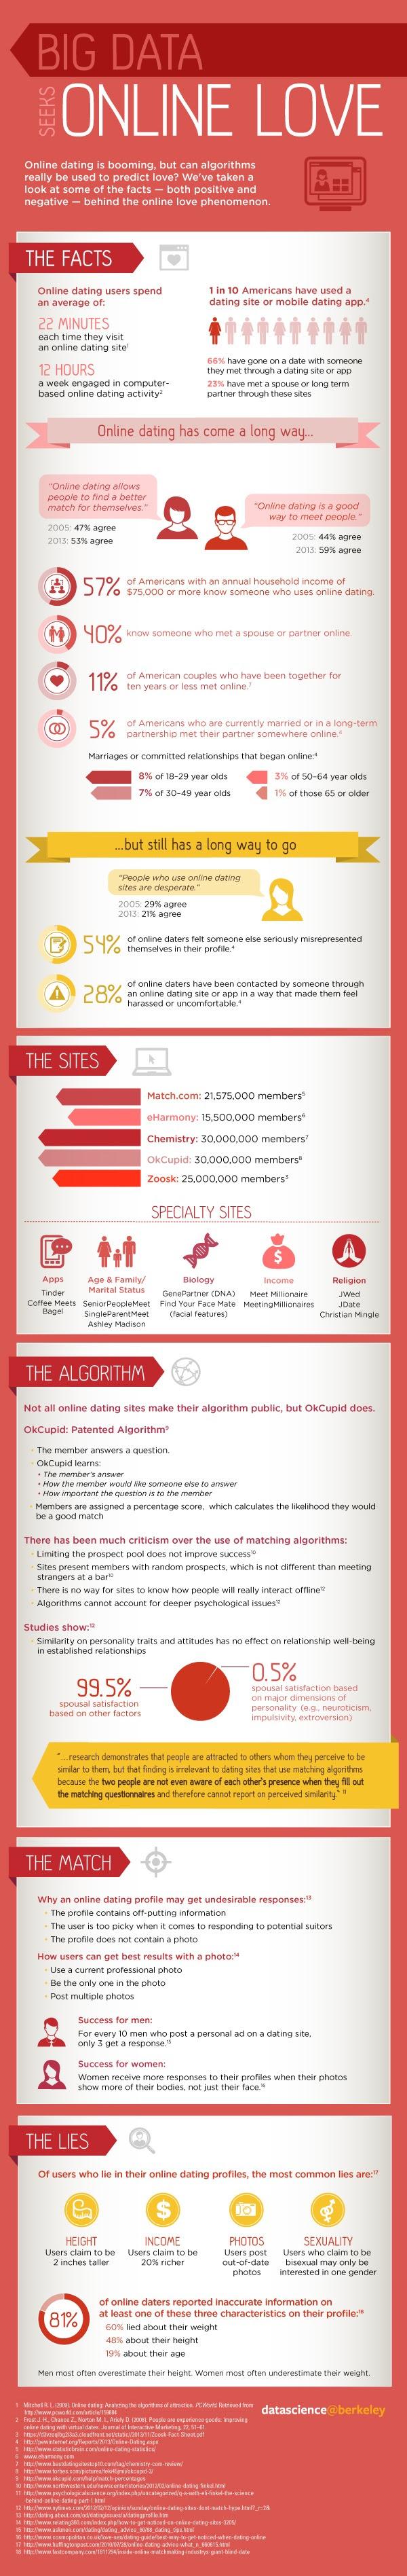 Infographic: Big Data Seeks Online Love #infographic